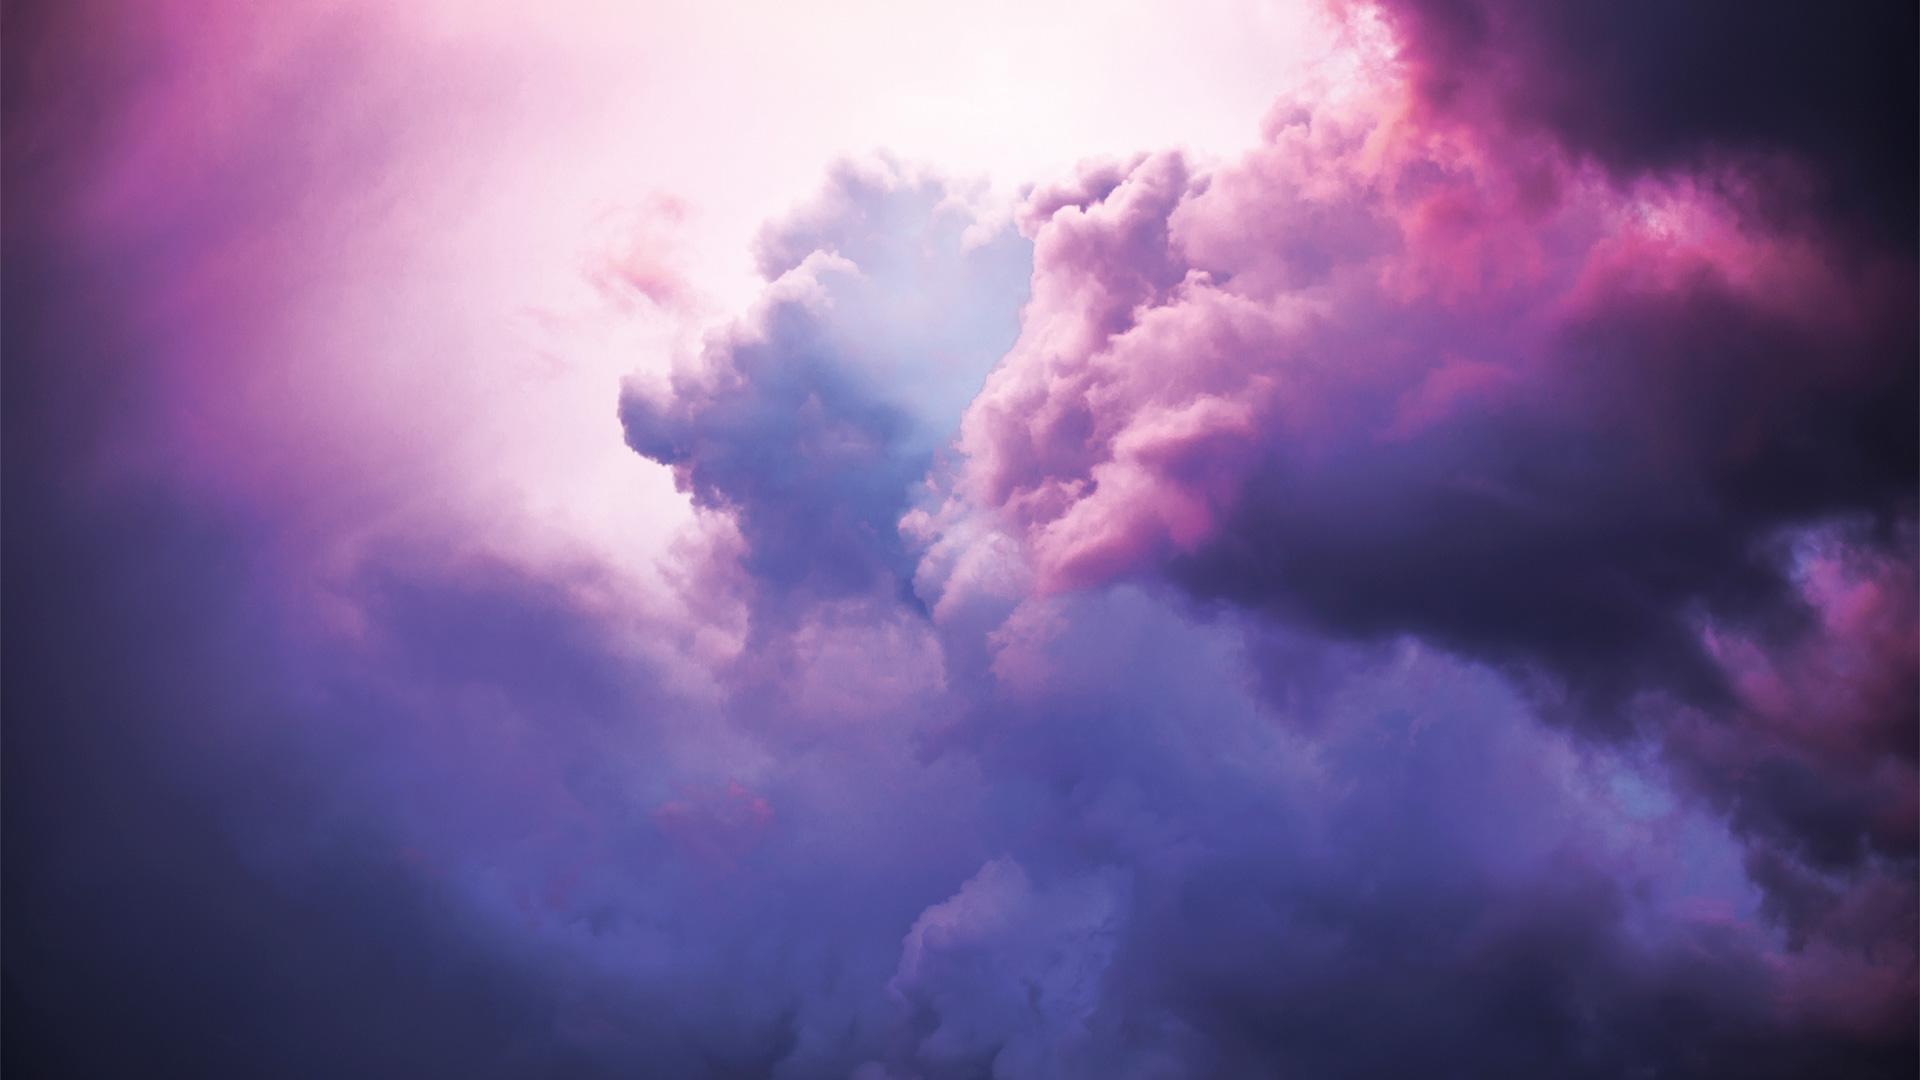 Treasurers urged to head to the cloud | Treasury Today